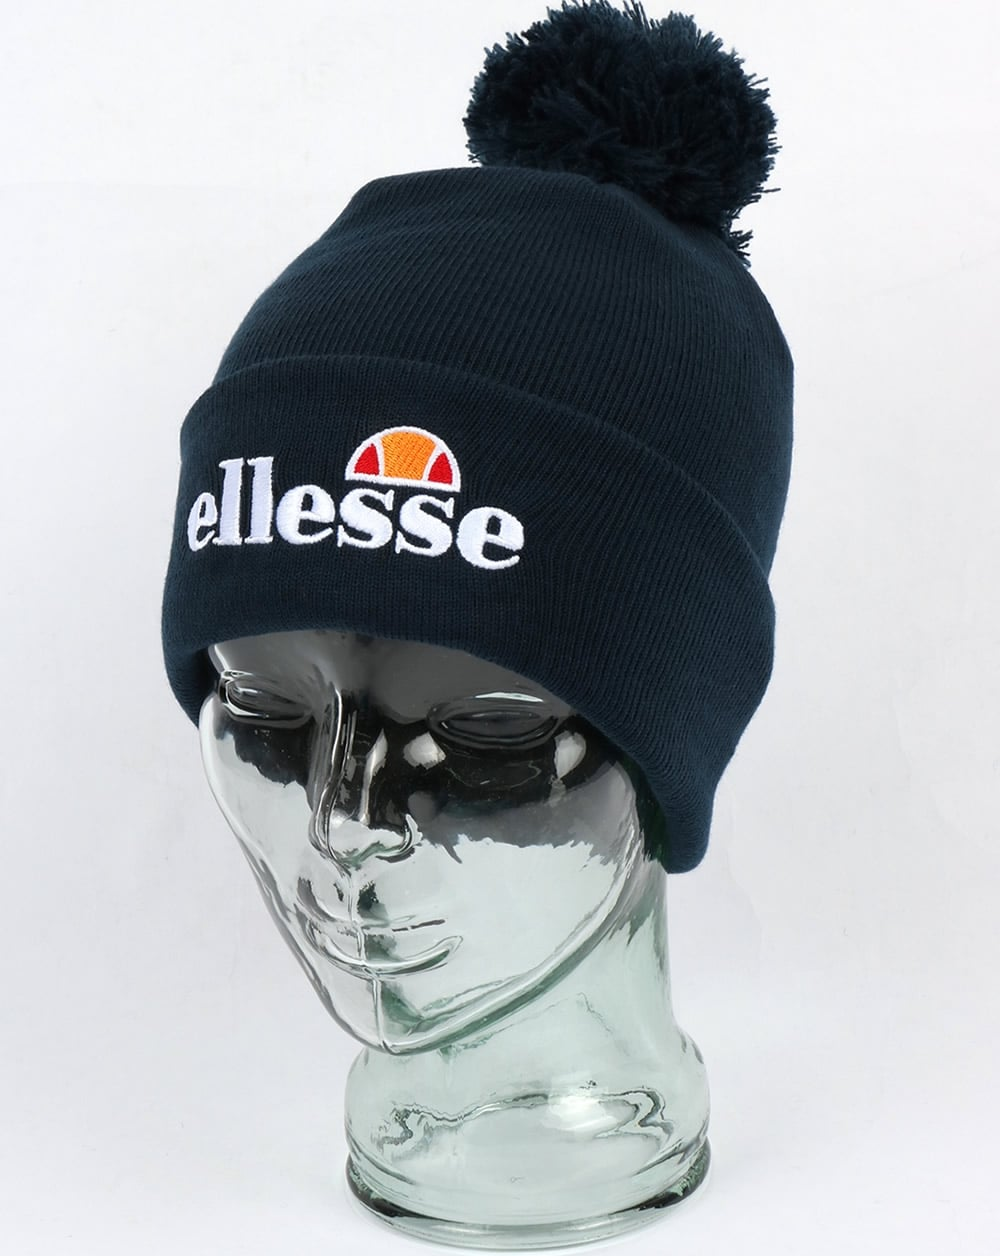 Ellesse Ellesse Bobble Beanie Hat Navy 5030212ae91